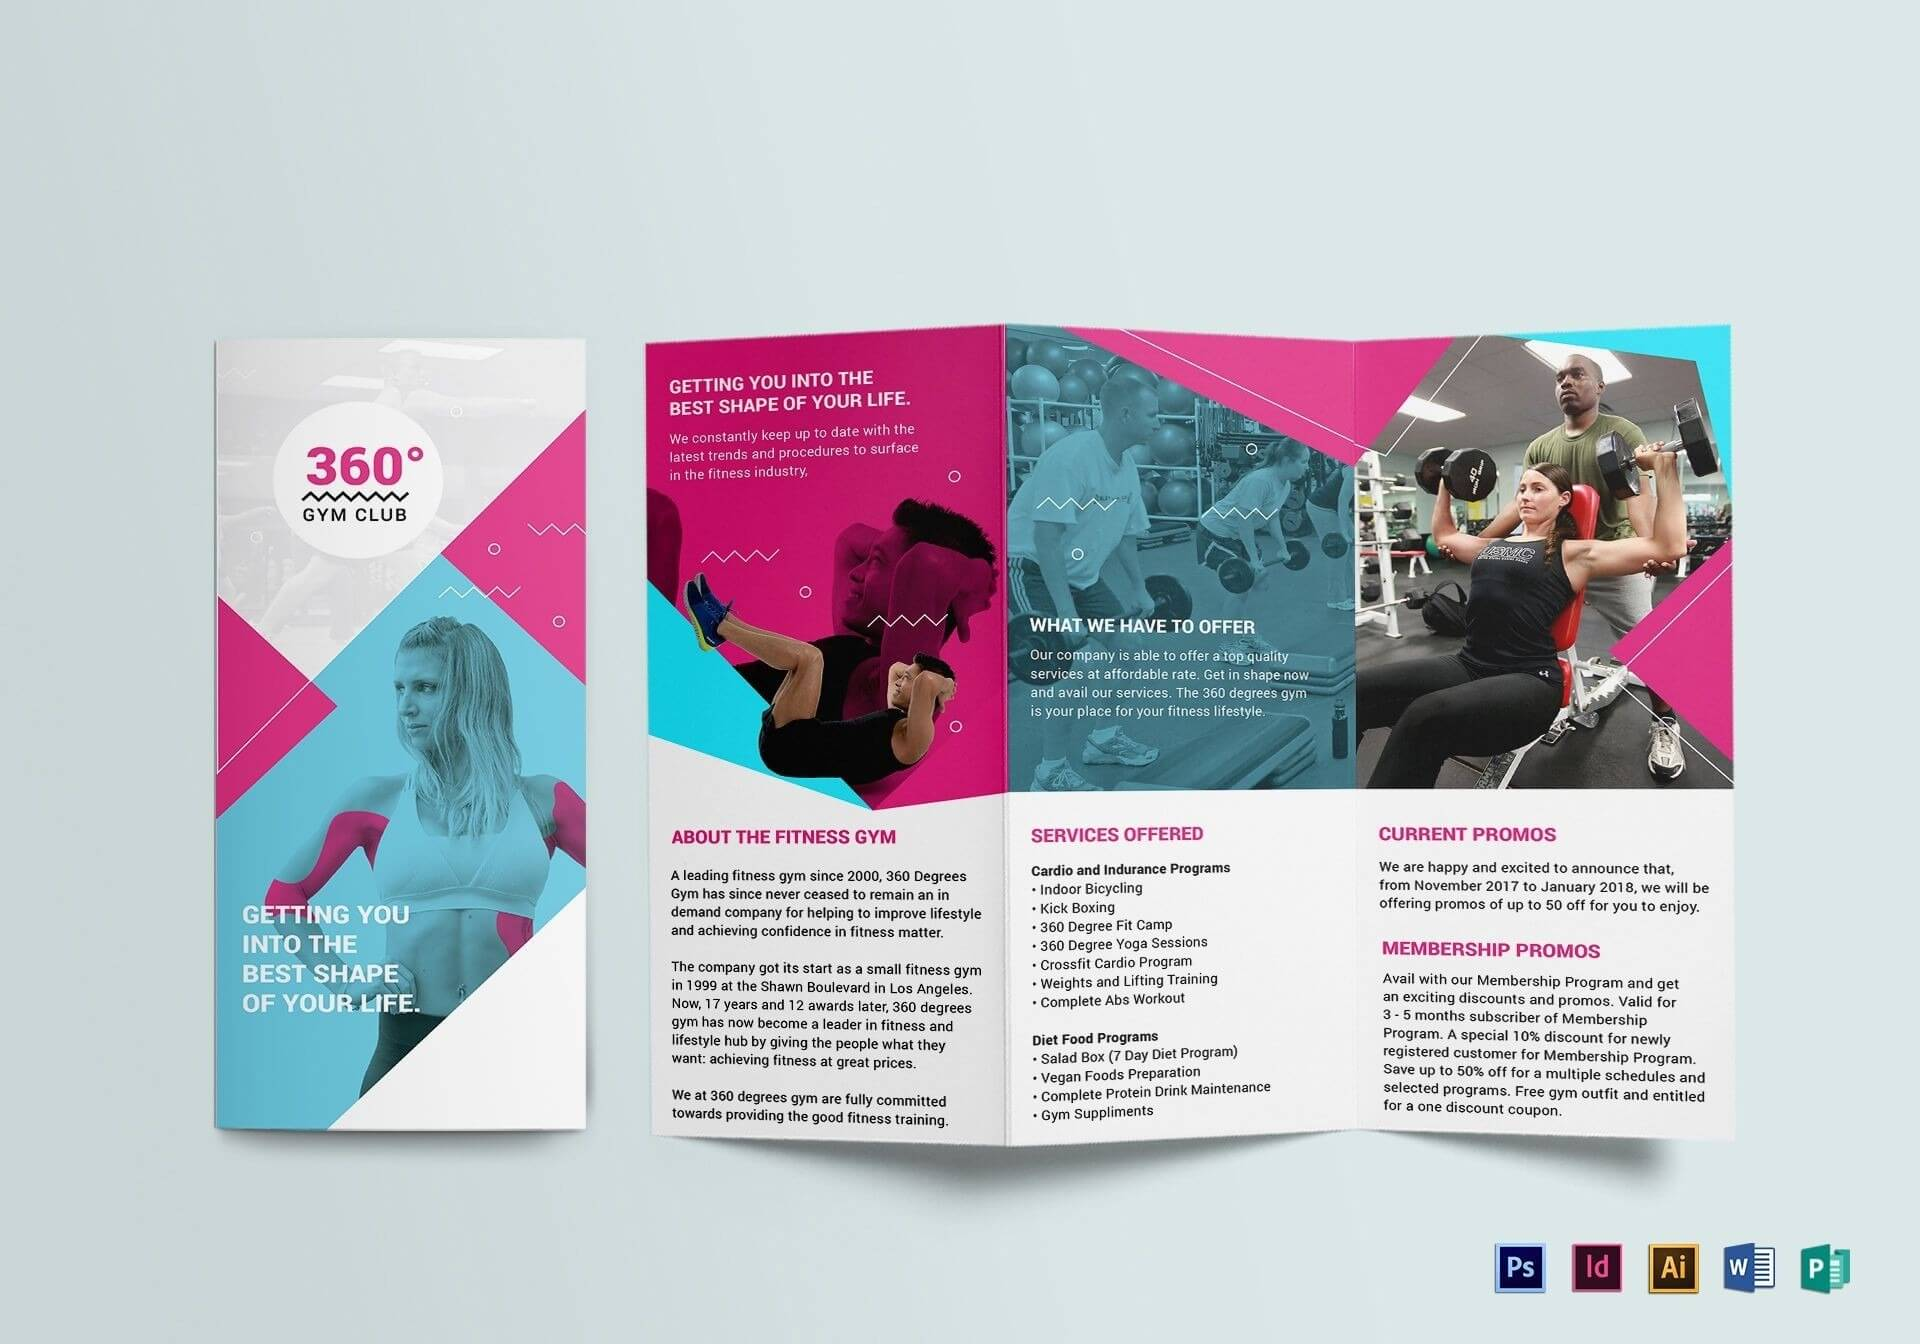 005 Free Microsoft Publisher Travel Brochure Template For Travel Brochure Template Ks2